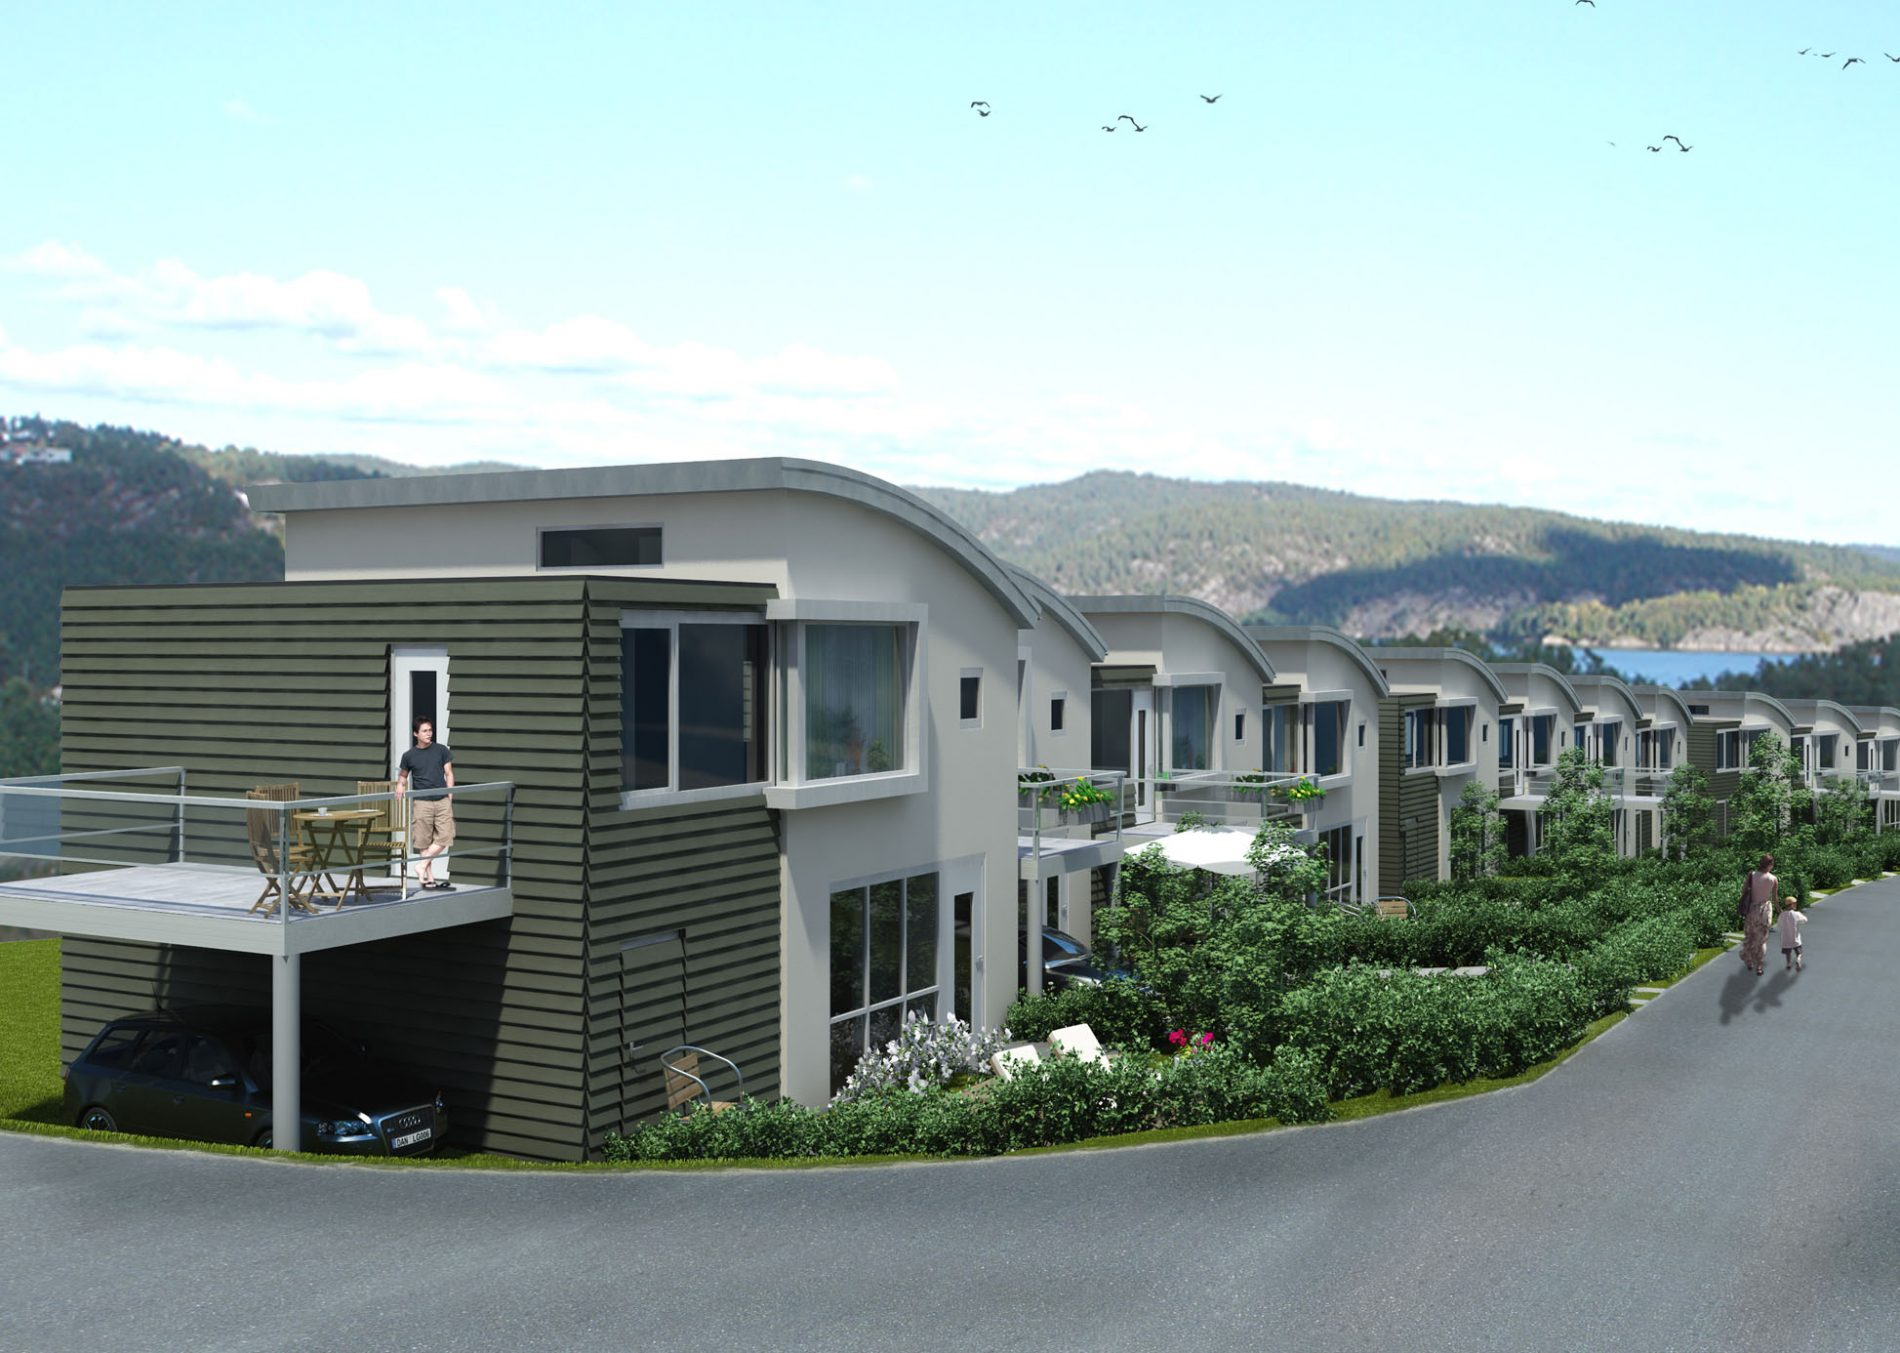 Justneshalvøya Kristiansand - Boliger - Point Design